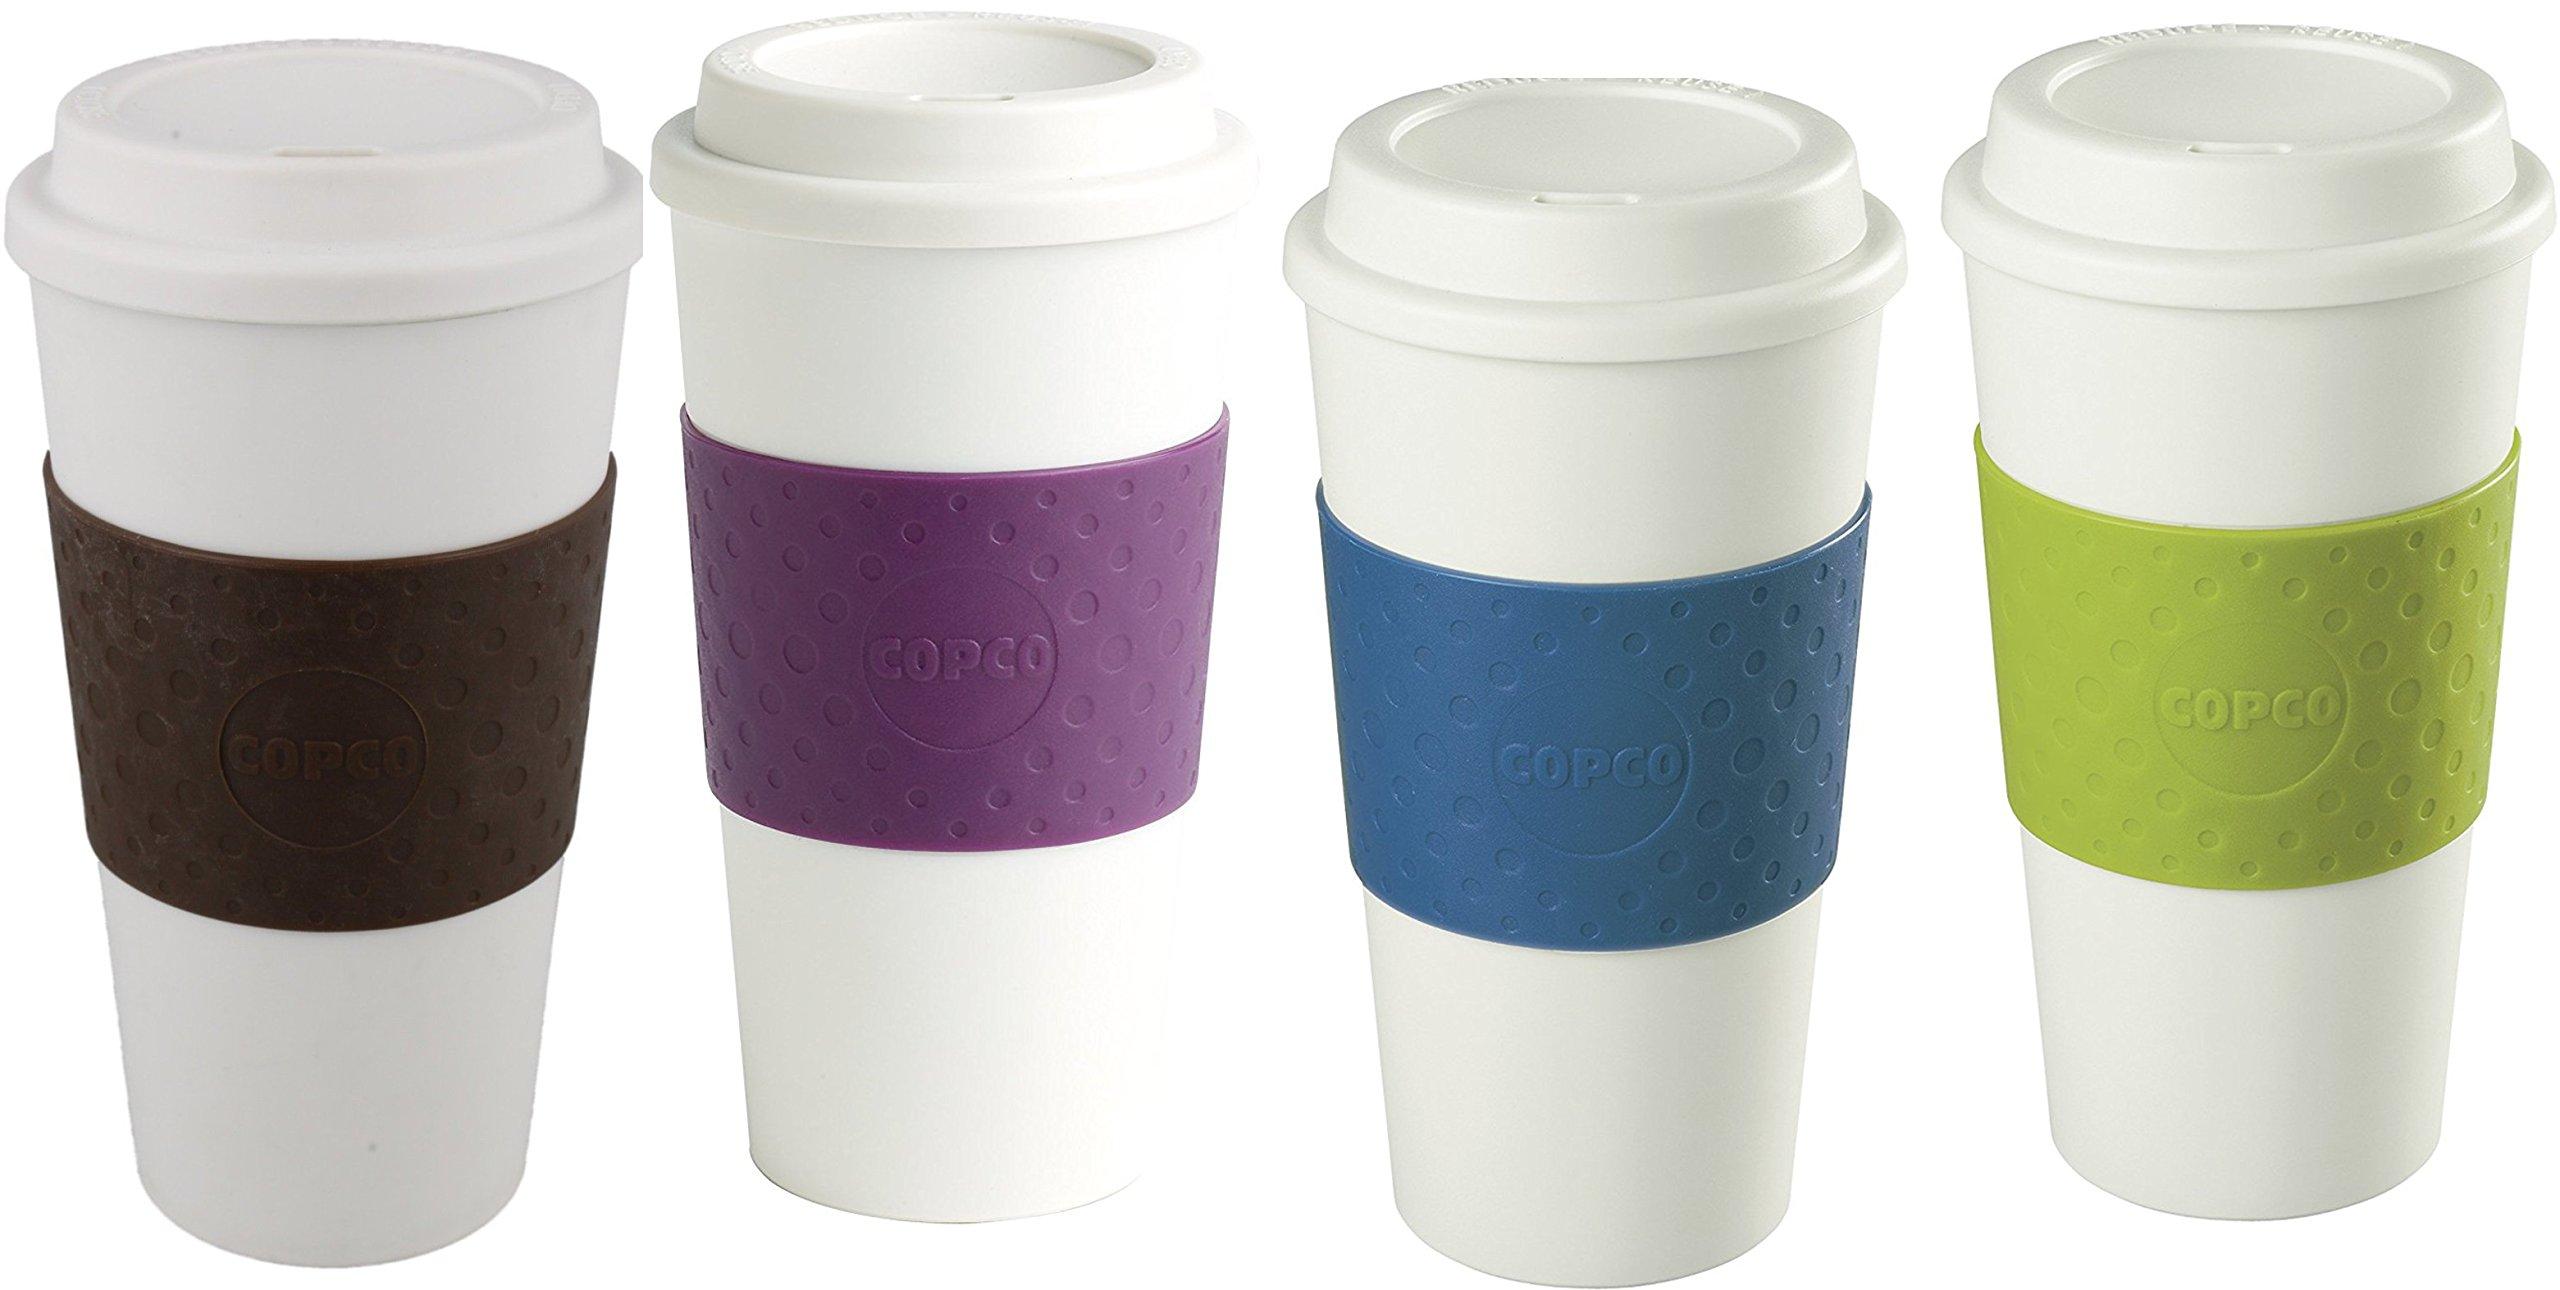 Copco Acadia Reusable To Go Mug, 16-ounce Capacity - 4-pack (Brown, Plum, Blue, Green)